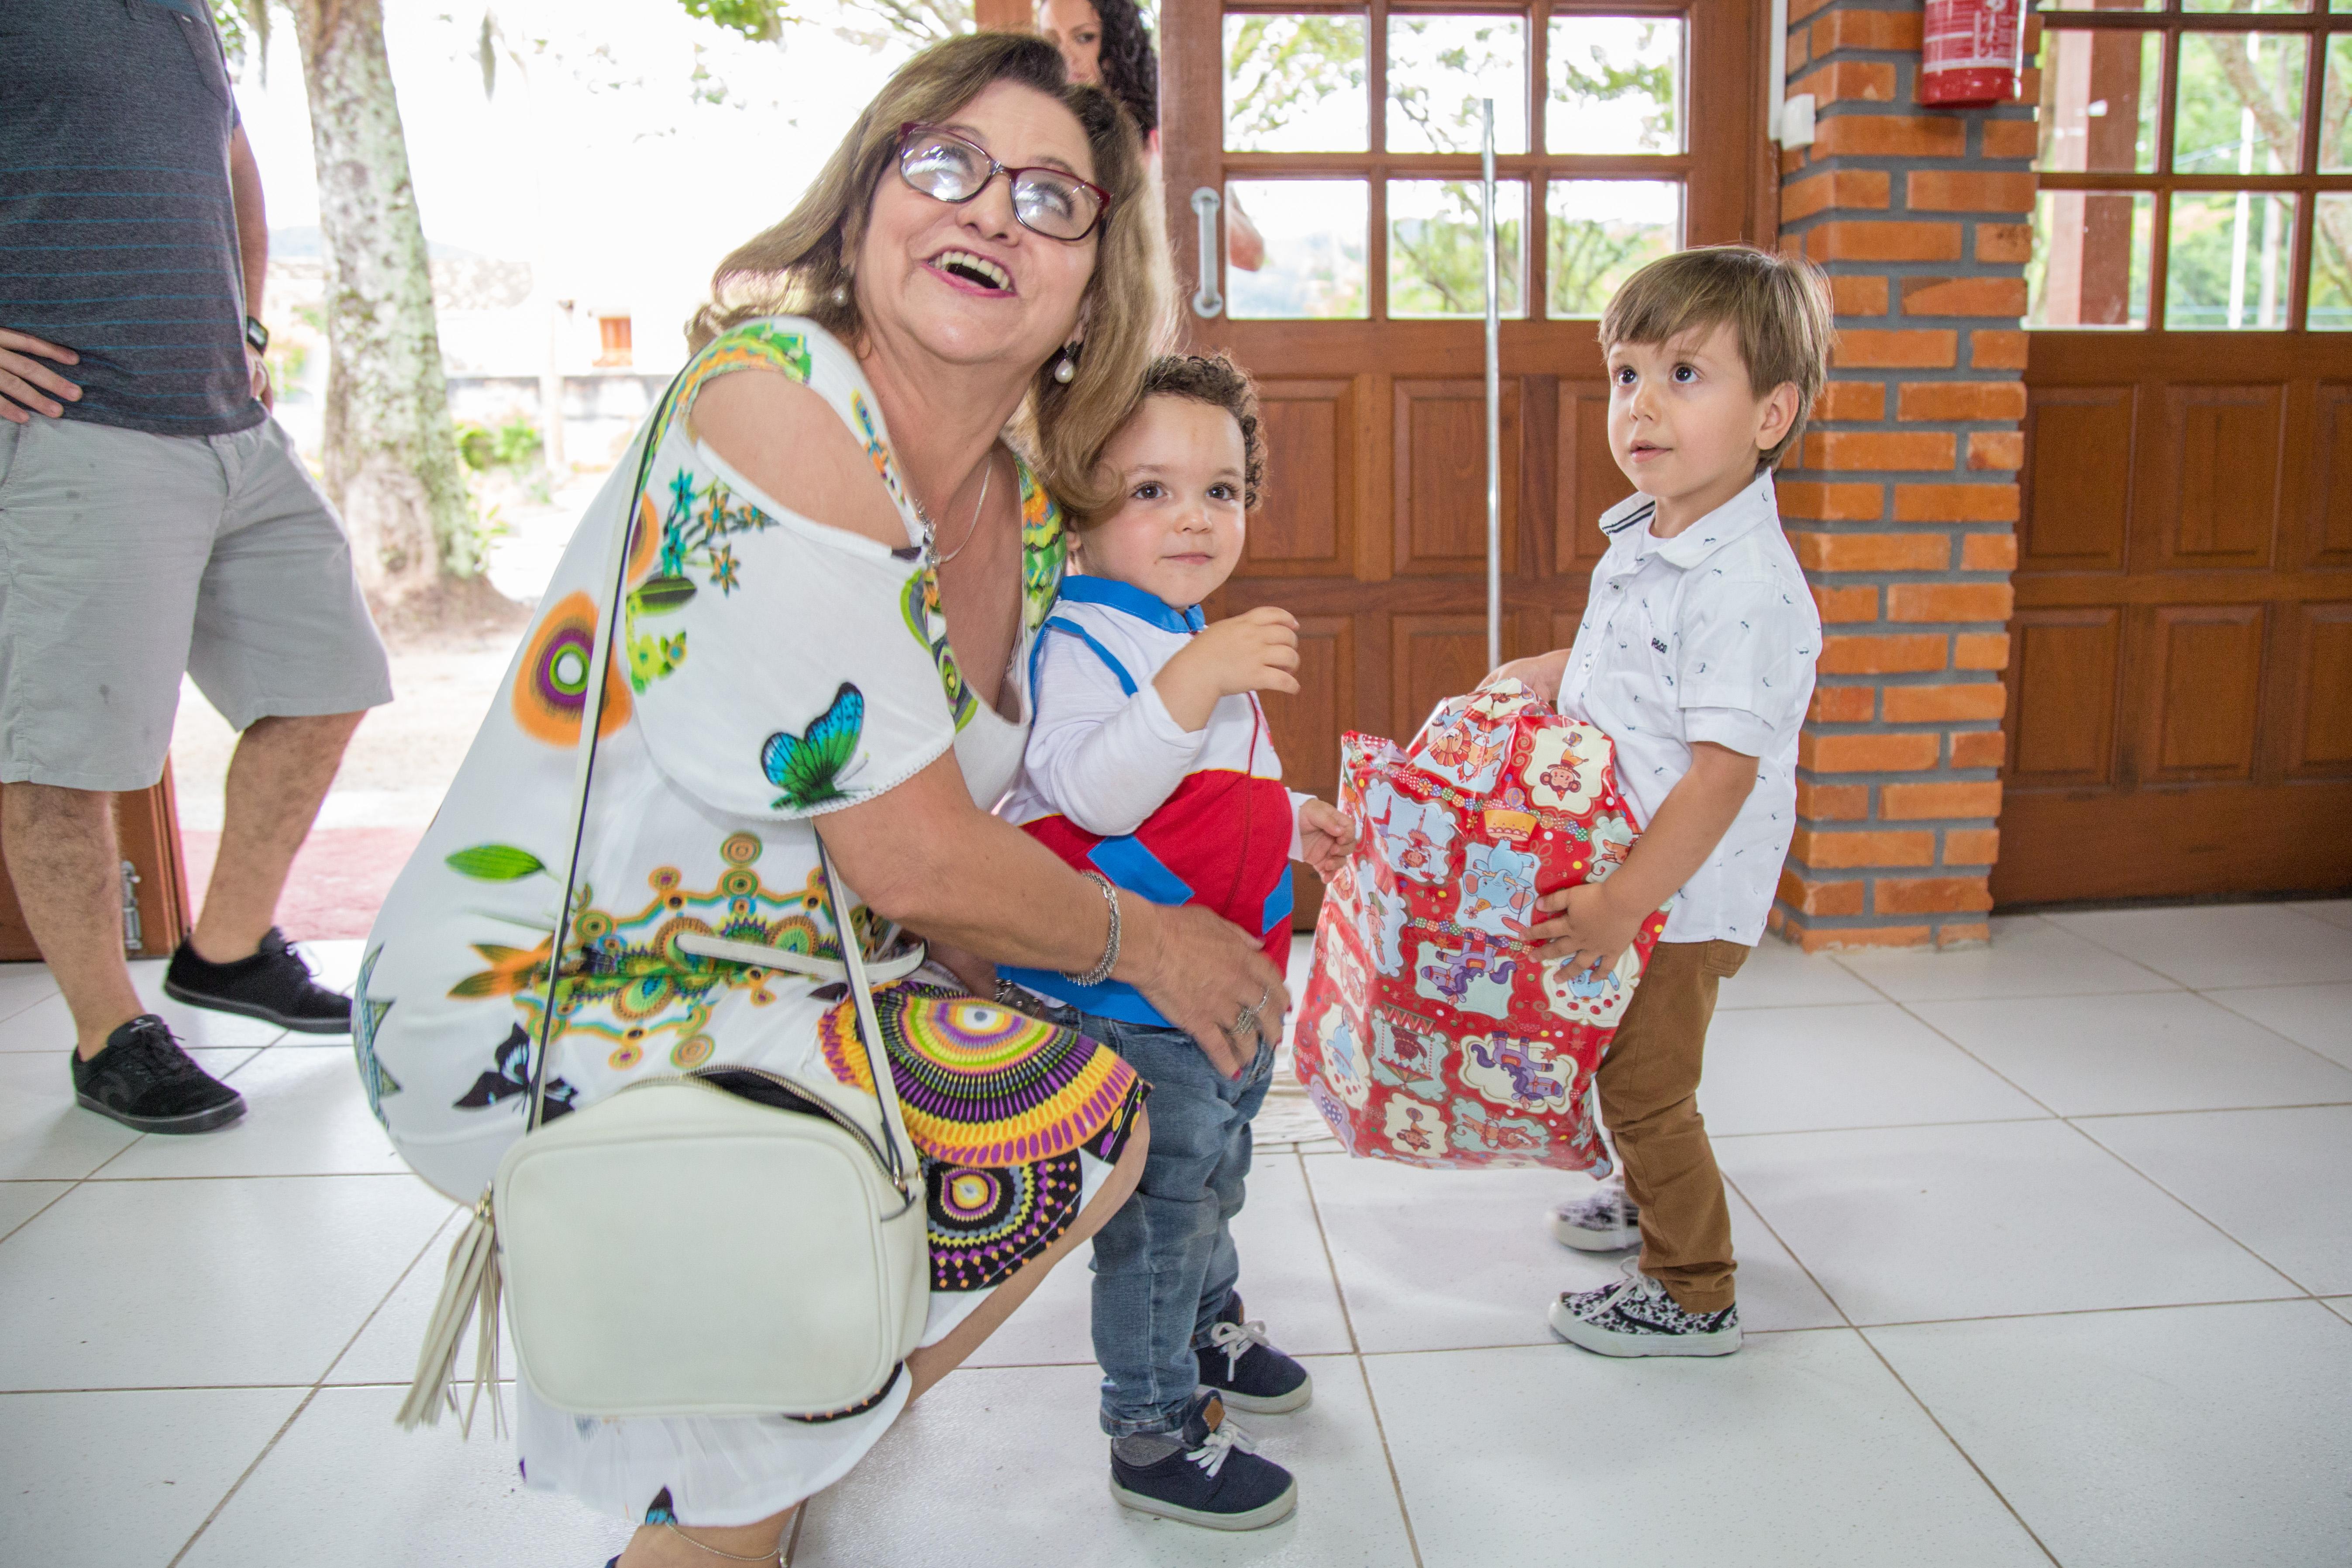 Festa‐Infantil‐Florianopolis‐Ana‐Marmo‐FotografiaFesta‐Infantil‐Florianopolis‐Ana‐Marmo‐Fotografia191A0352